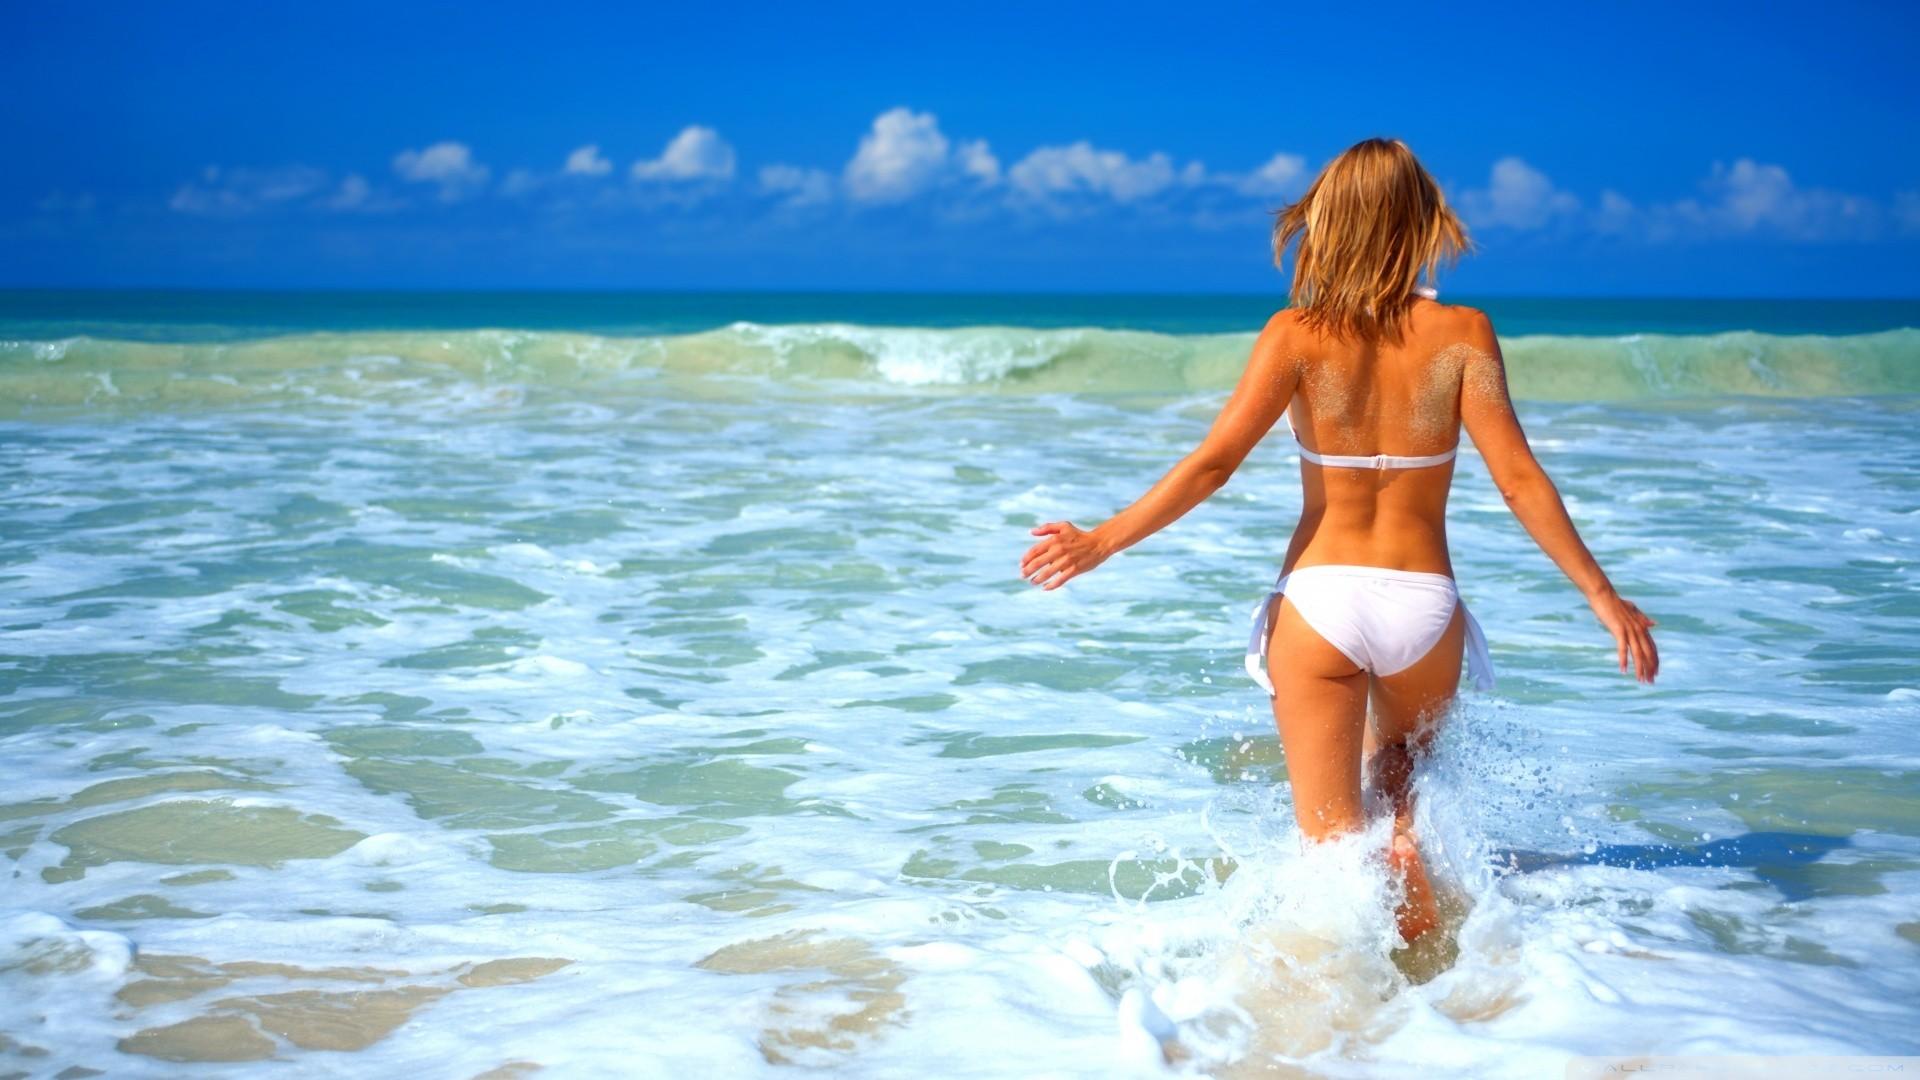 People 1920x1080 women women on beach blonde in water summer white bikini back tanned sand covered